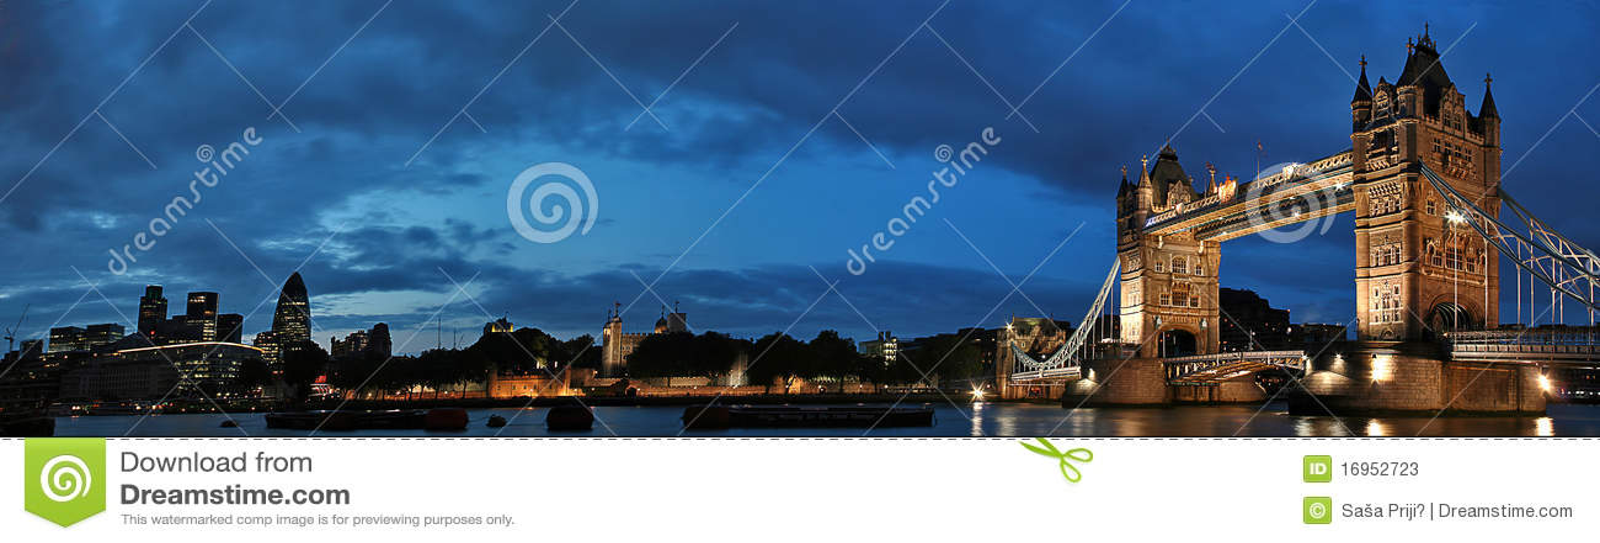 London Towe bridge